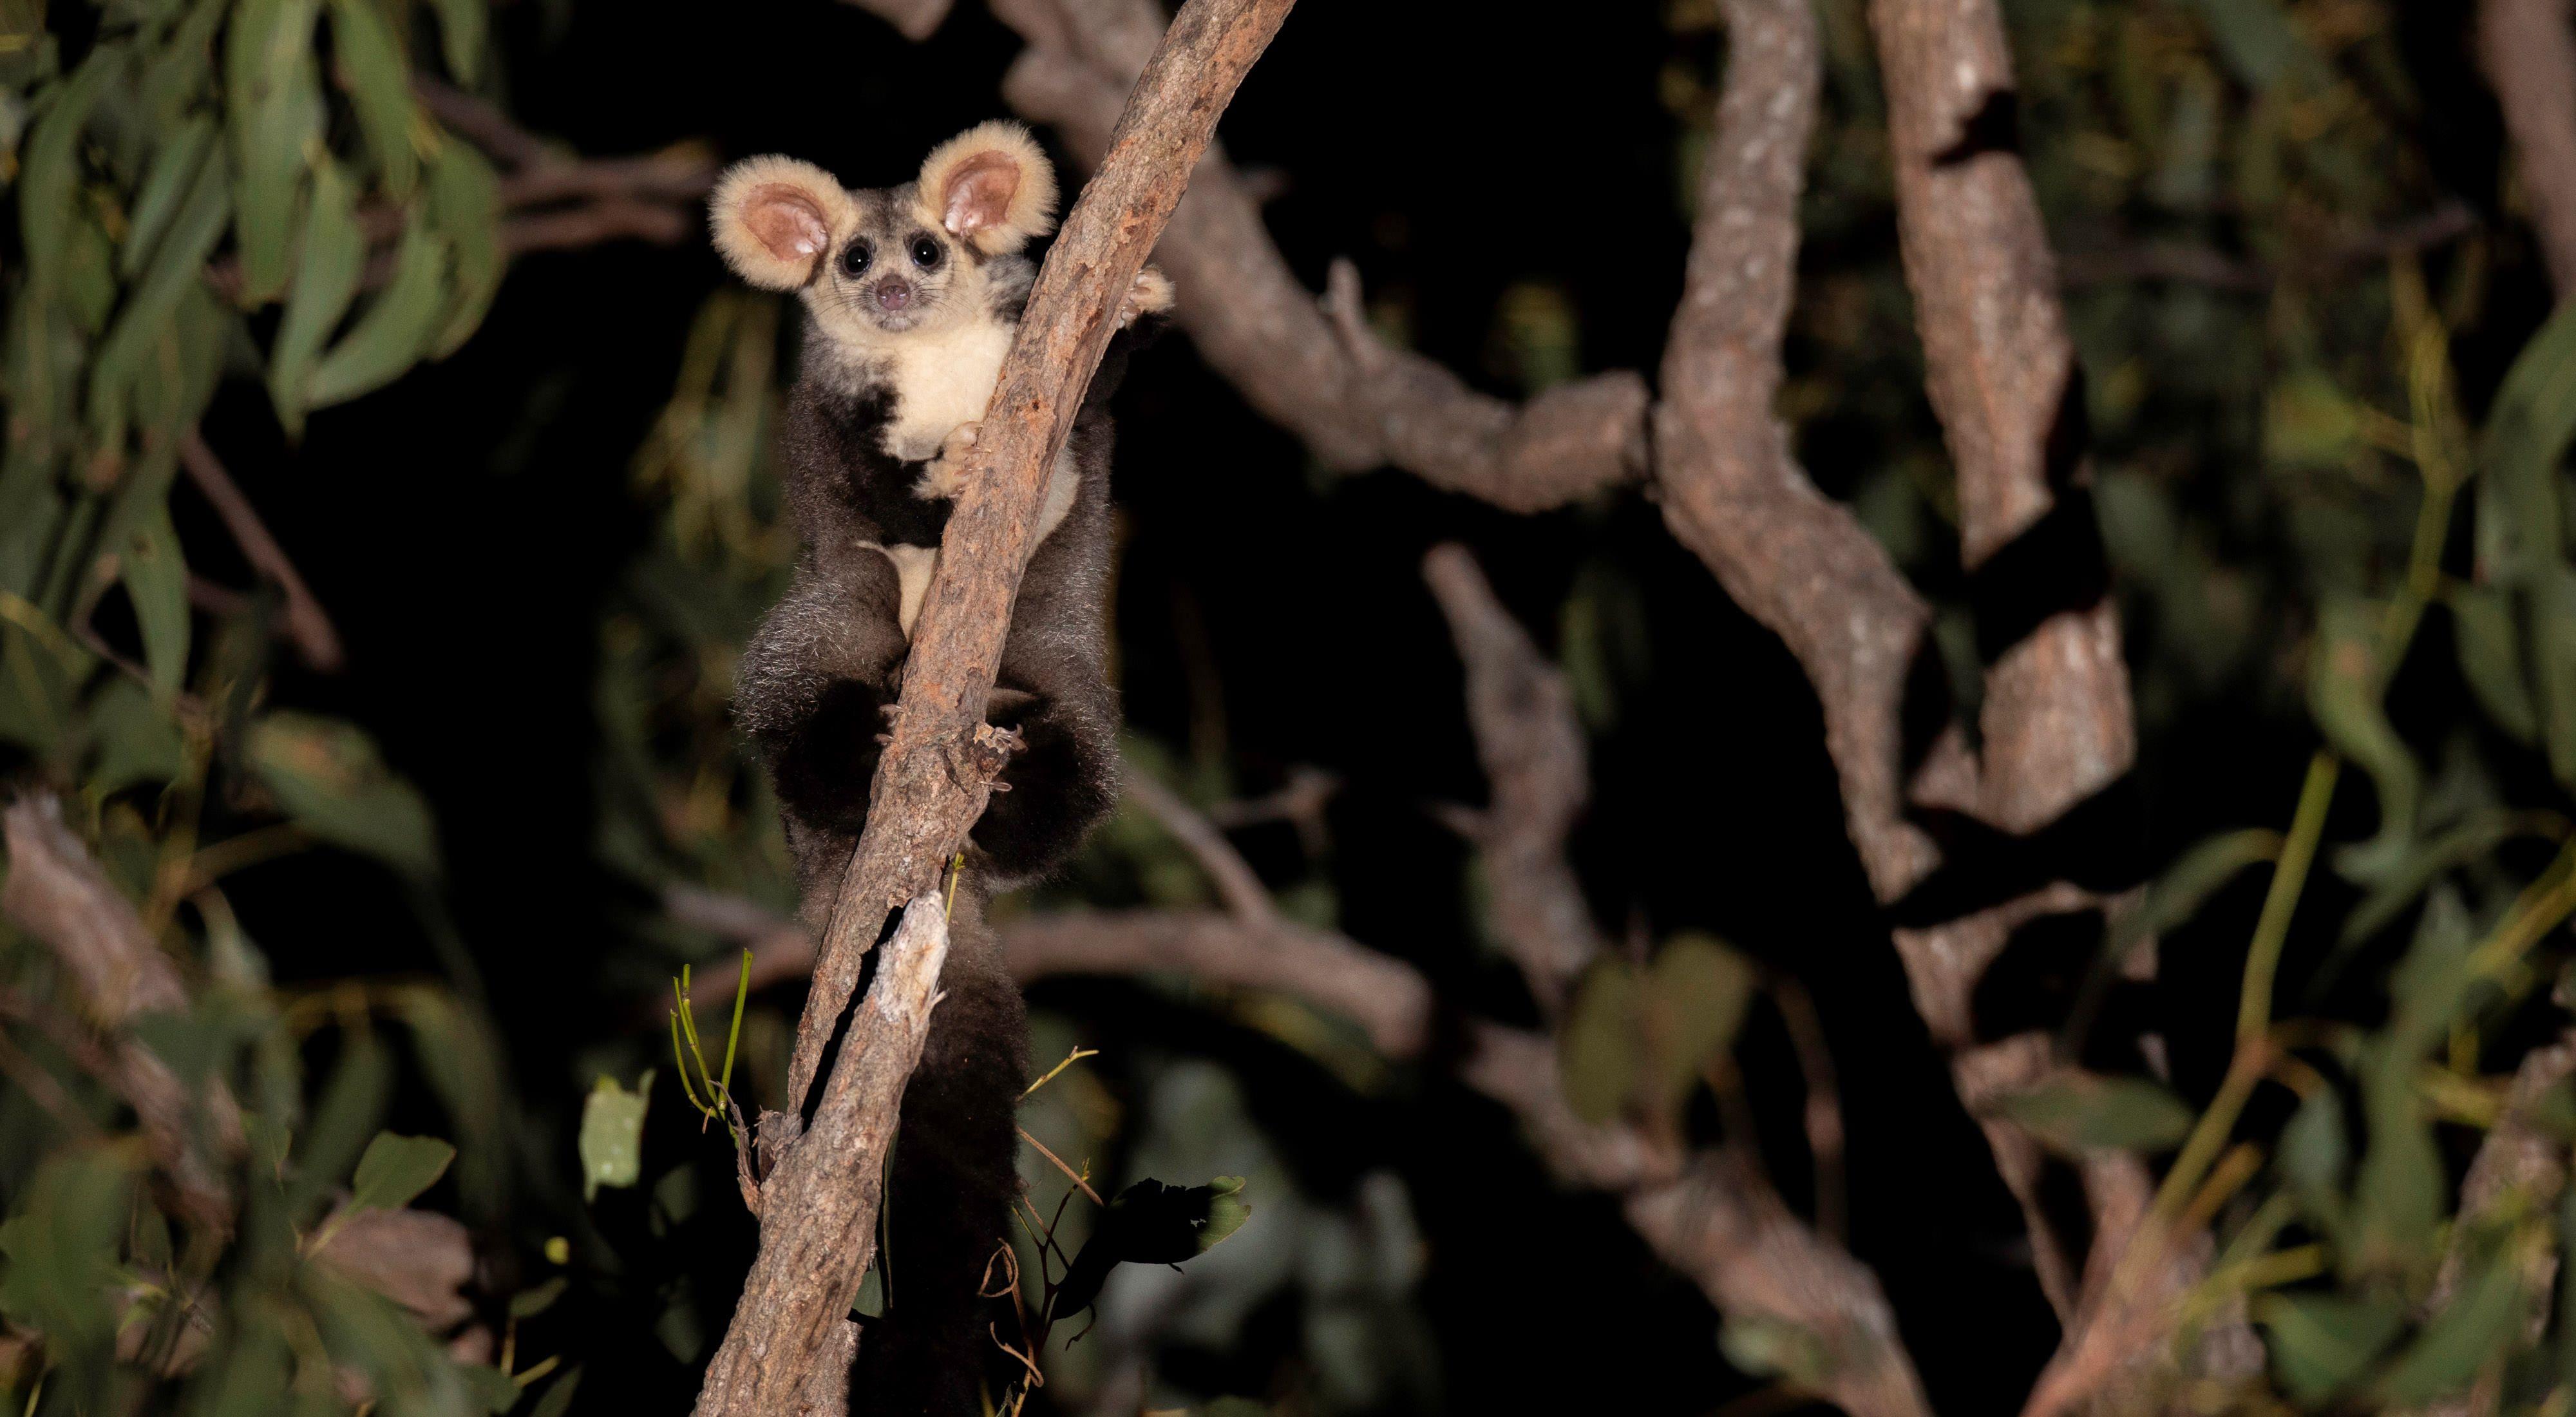 during Australia's 2019/2020 mega bushfires alone 30% of their habitat was destroyed